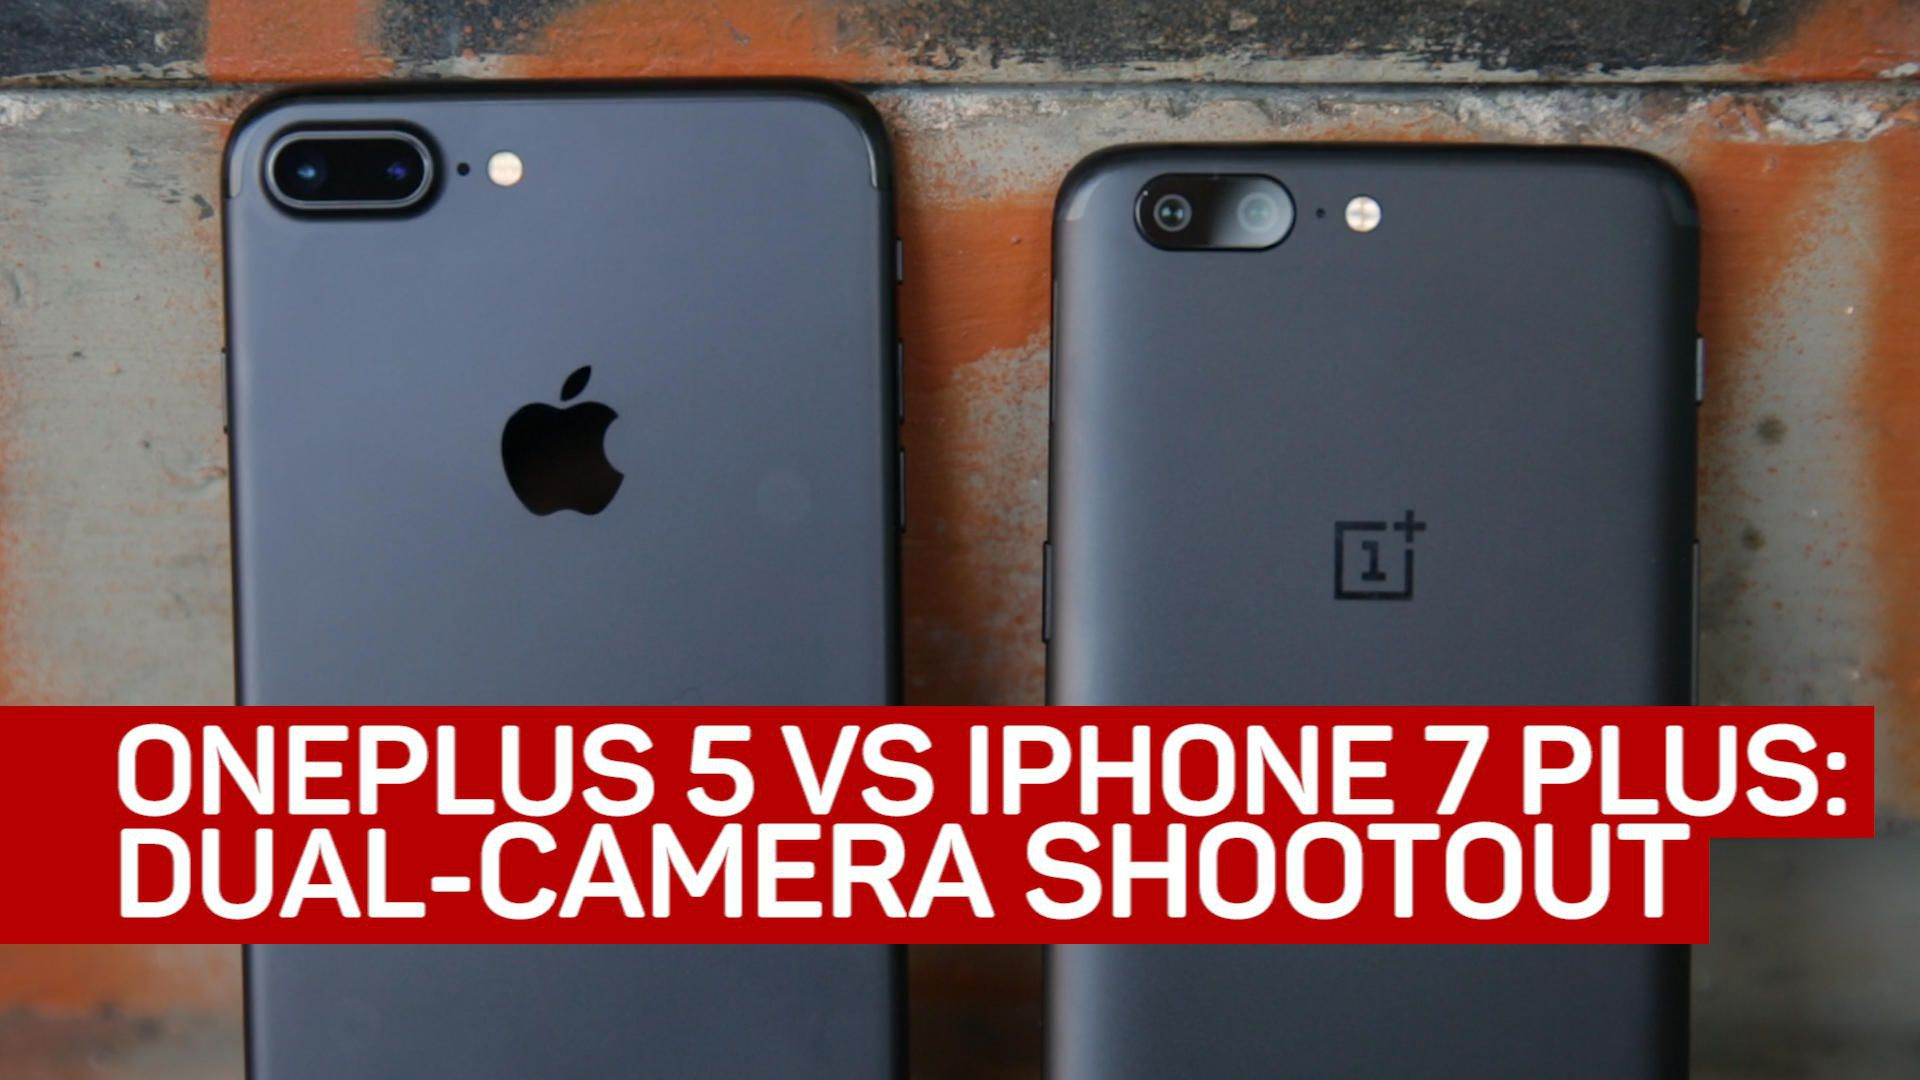 OnePlus 5 vs. iPhone 7 Plus: Dual-camera shootout